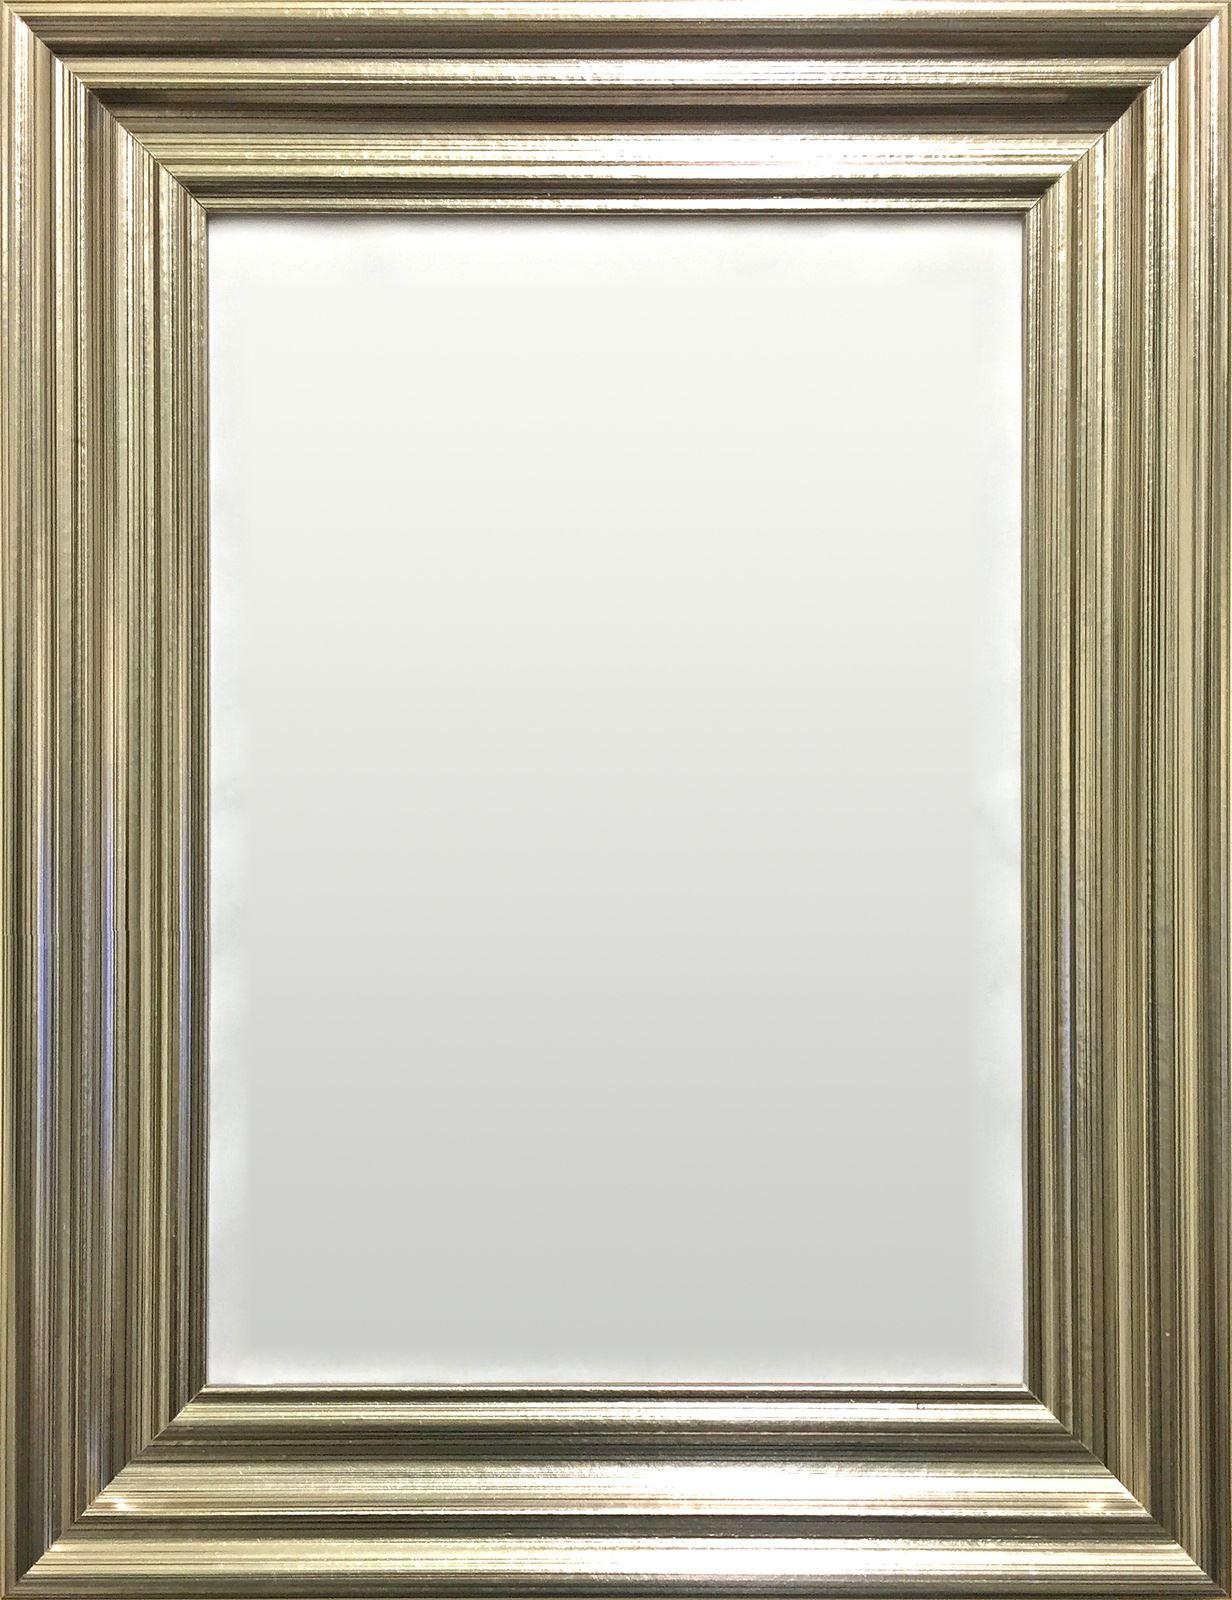 Poster Picture Frame Wide Swept Molding Gloss Finish Black Oak White ...